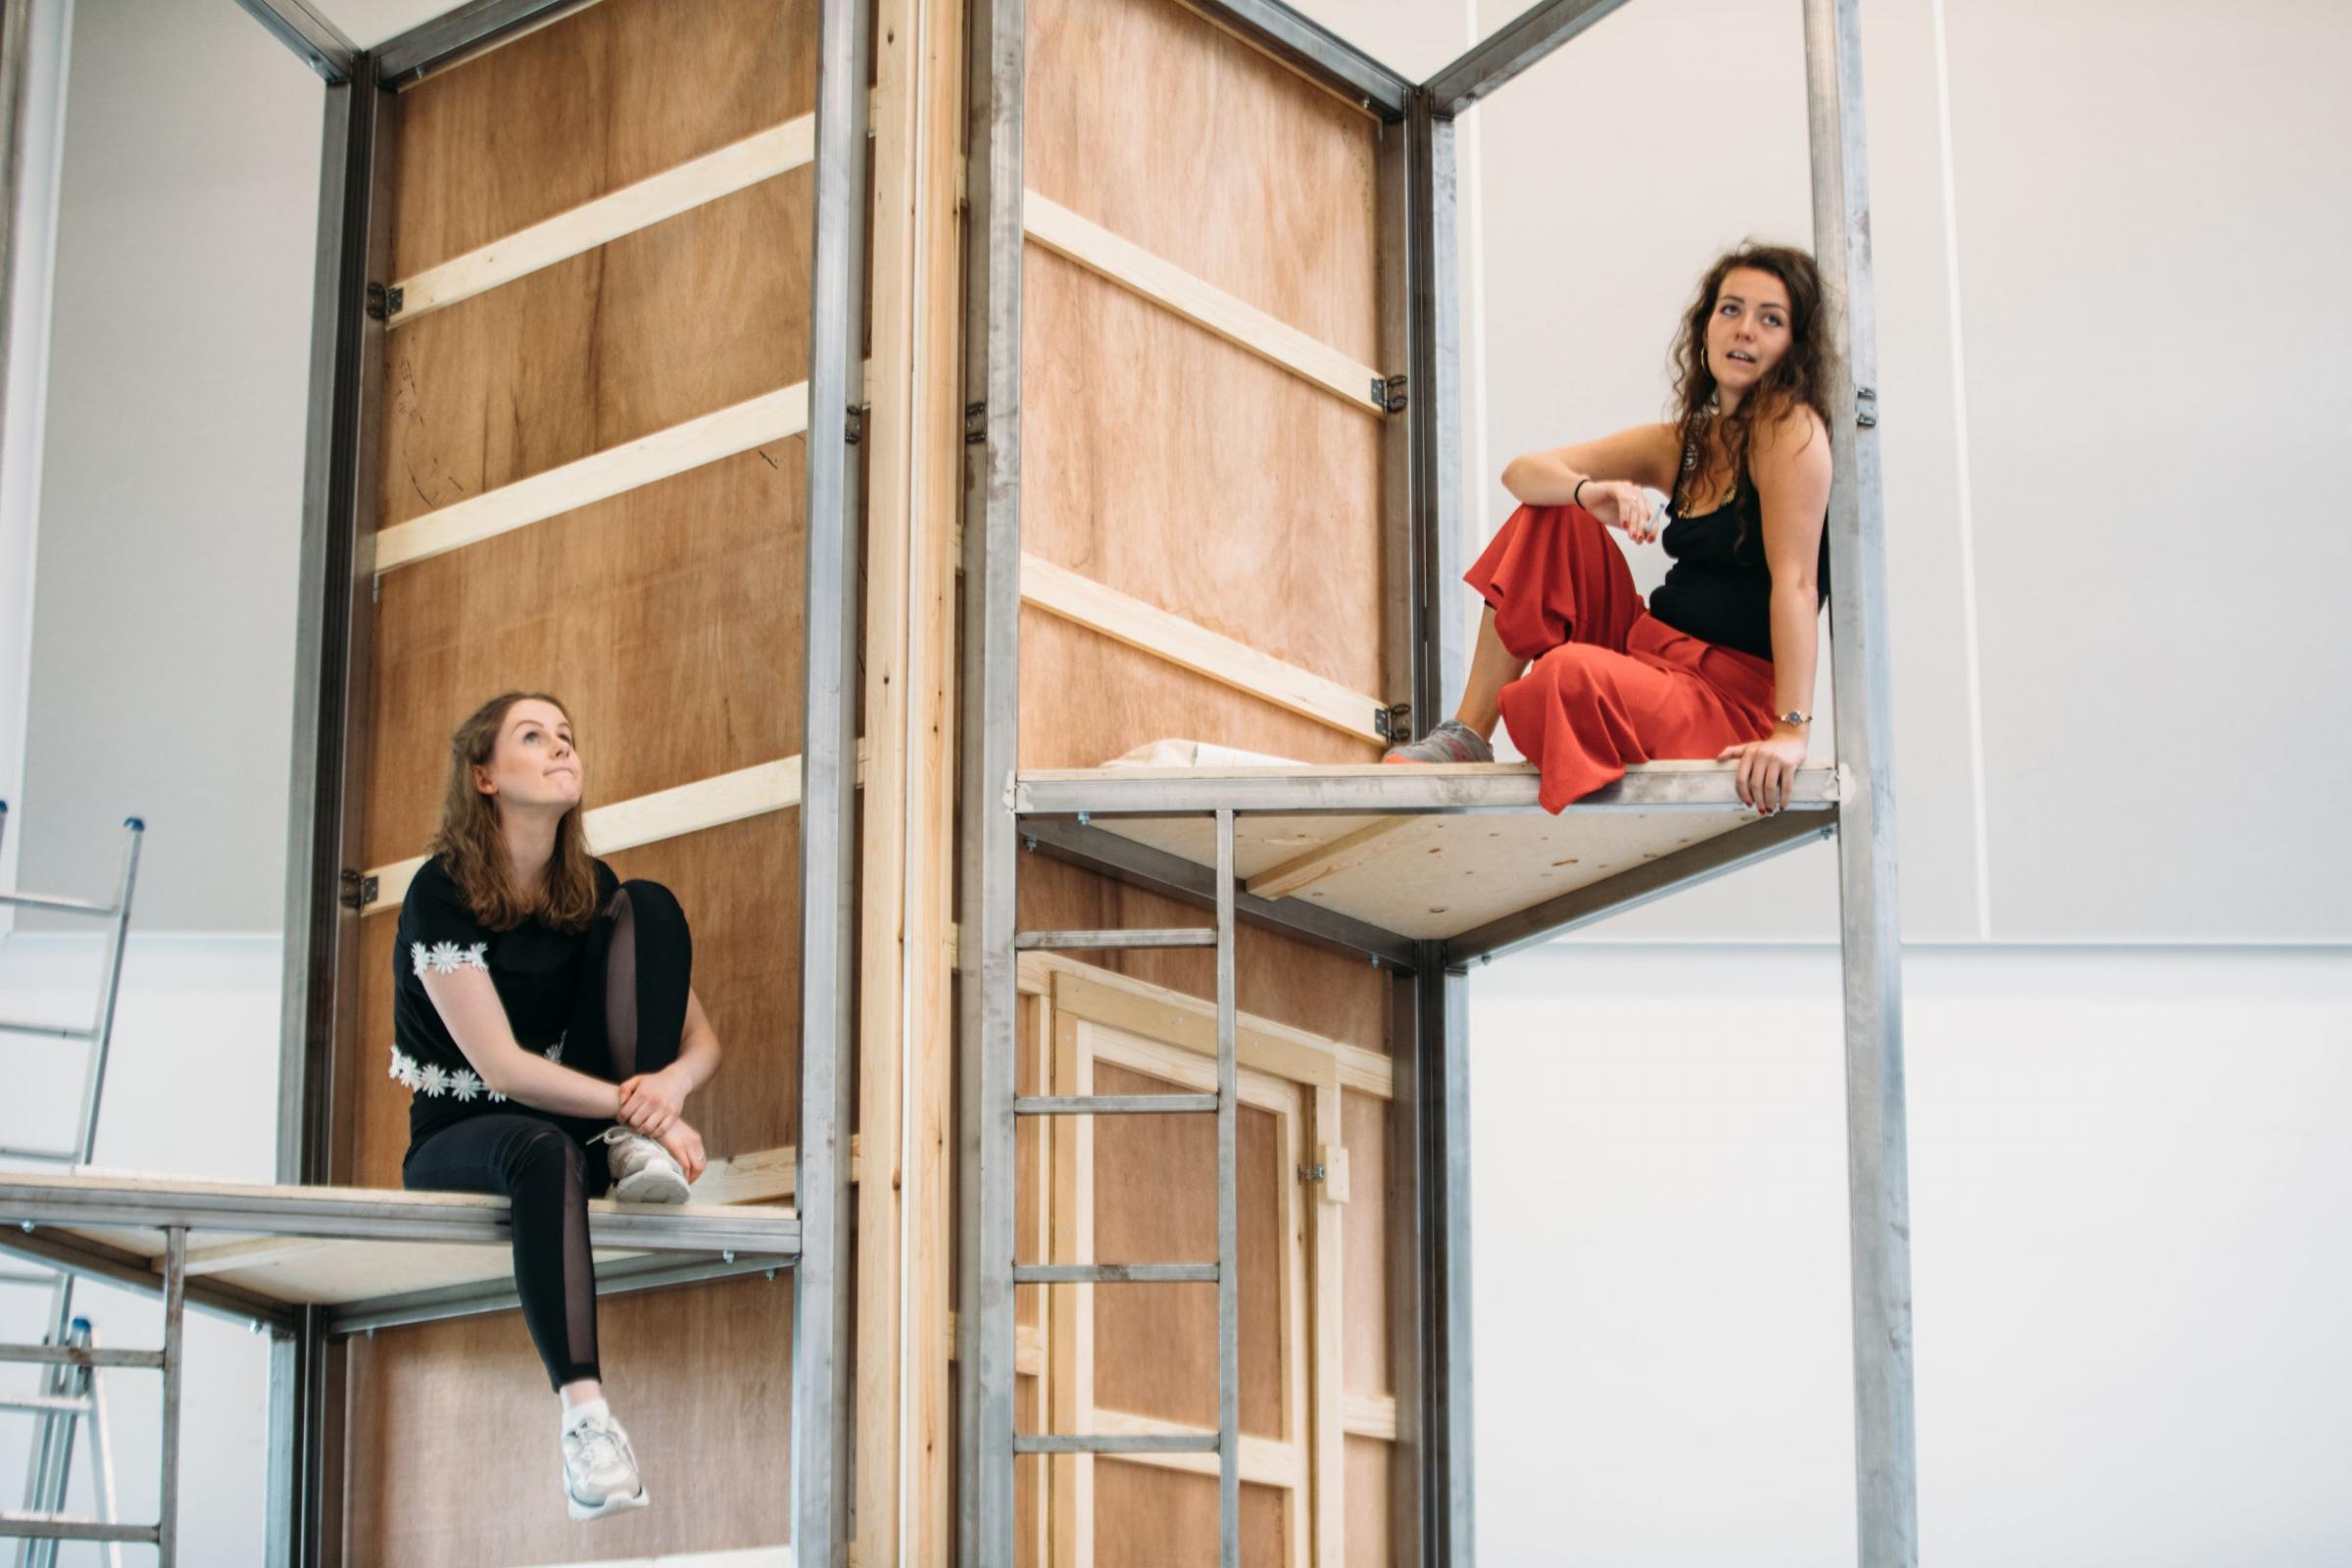 Jenni Fagan's Panopticon puts the spotlight on defiant teen